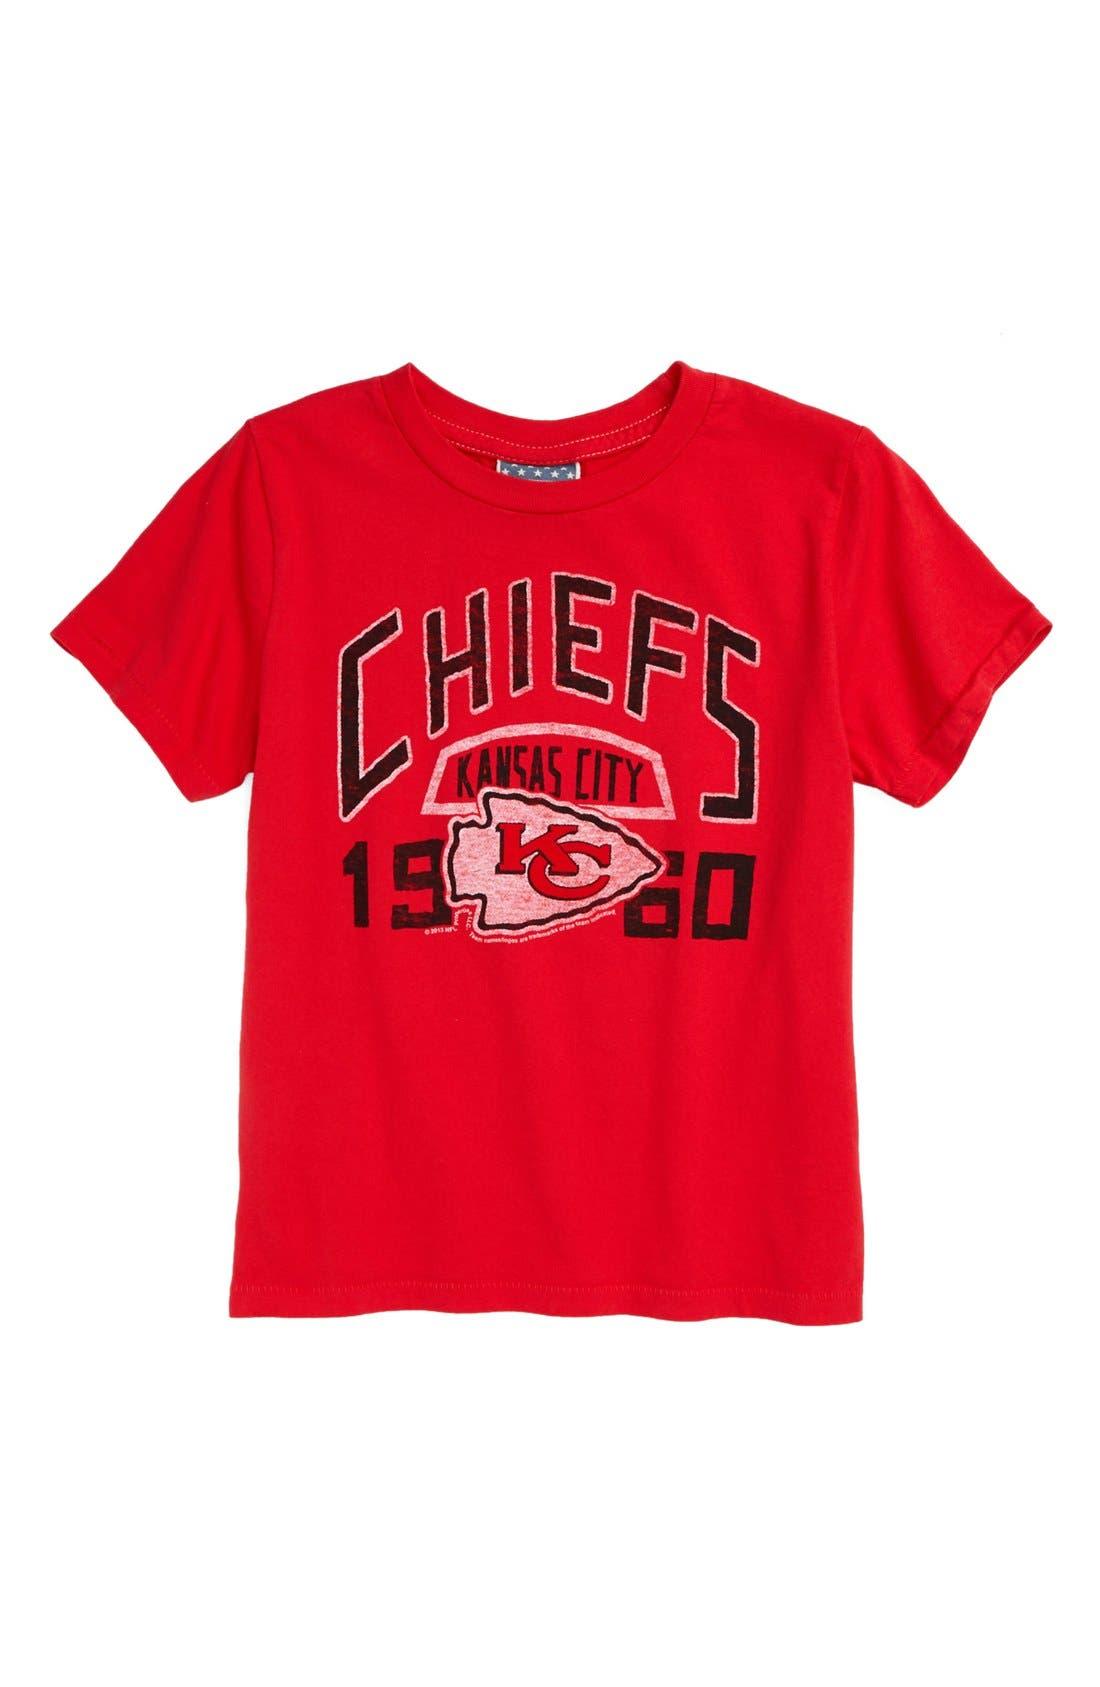 Alternate Image 1 Selected - Junk Food 'Kansas City Chiefs' T-Shirt (Toddler Boys)